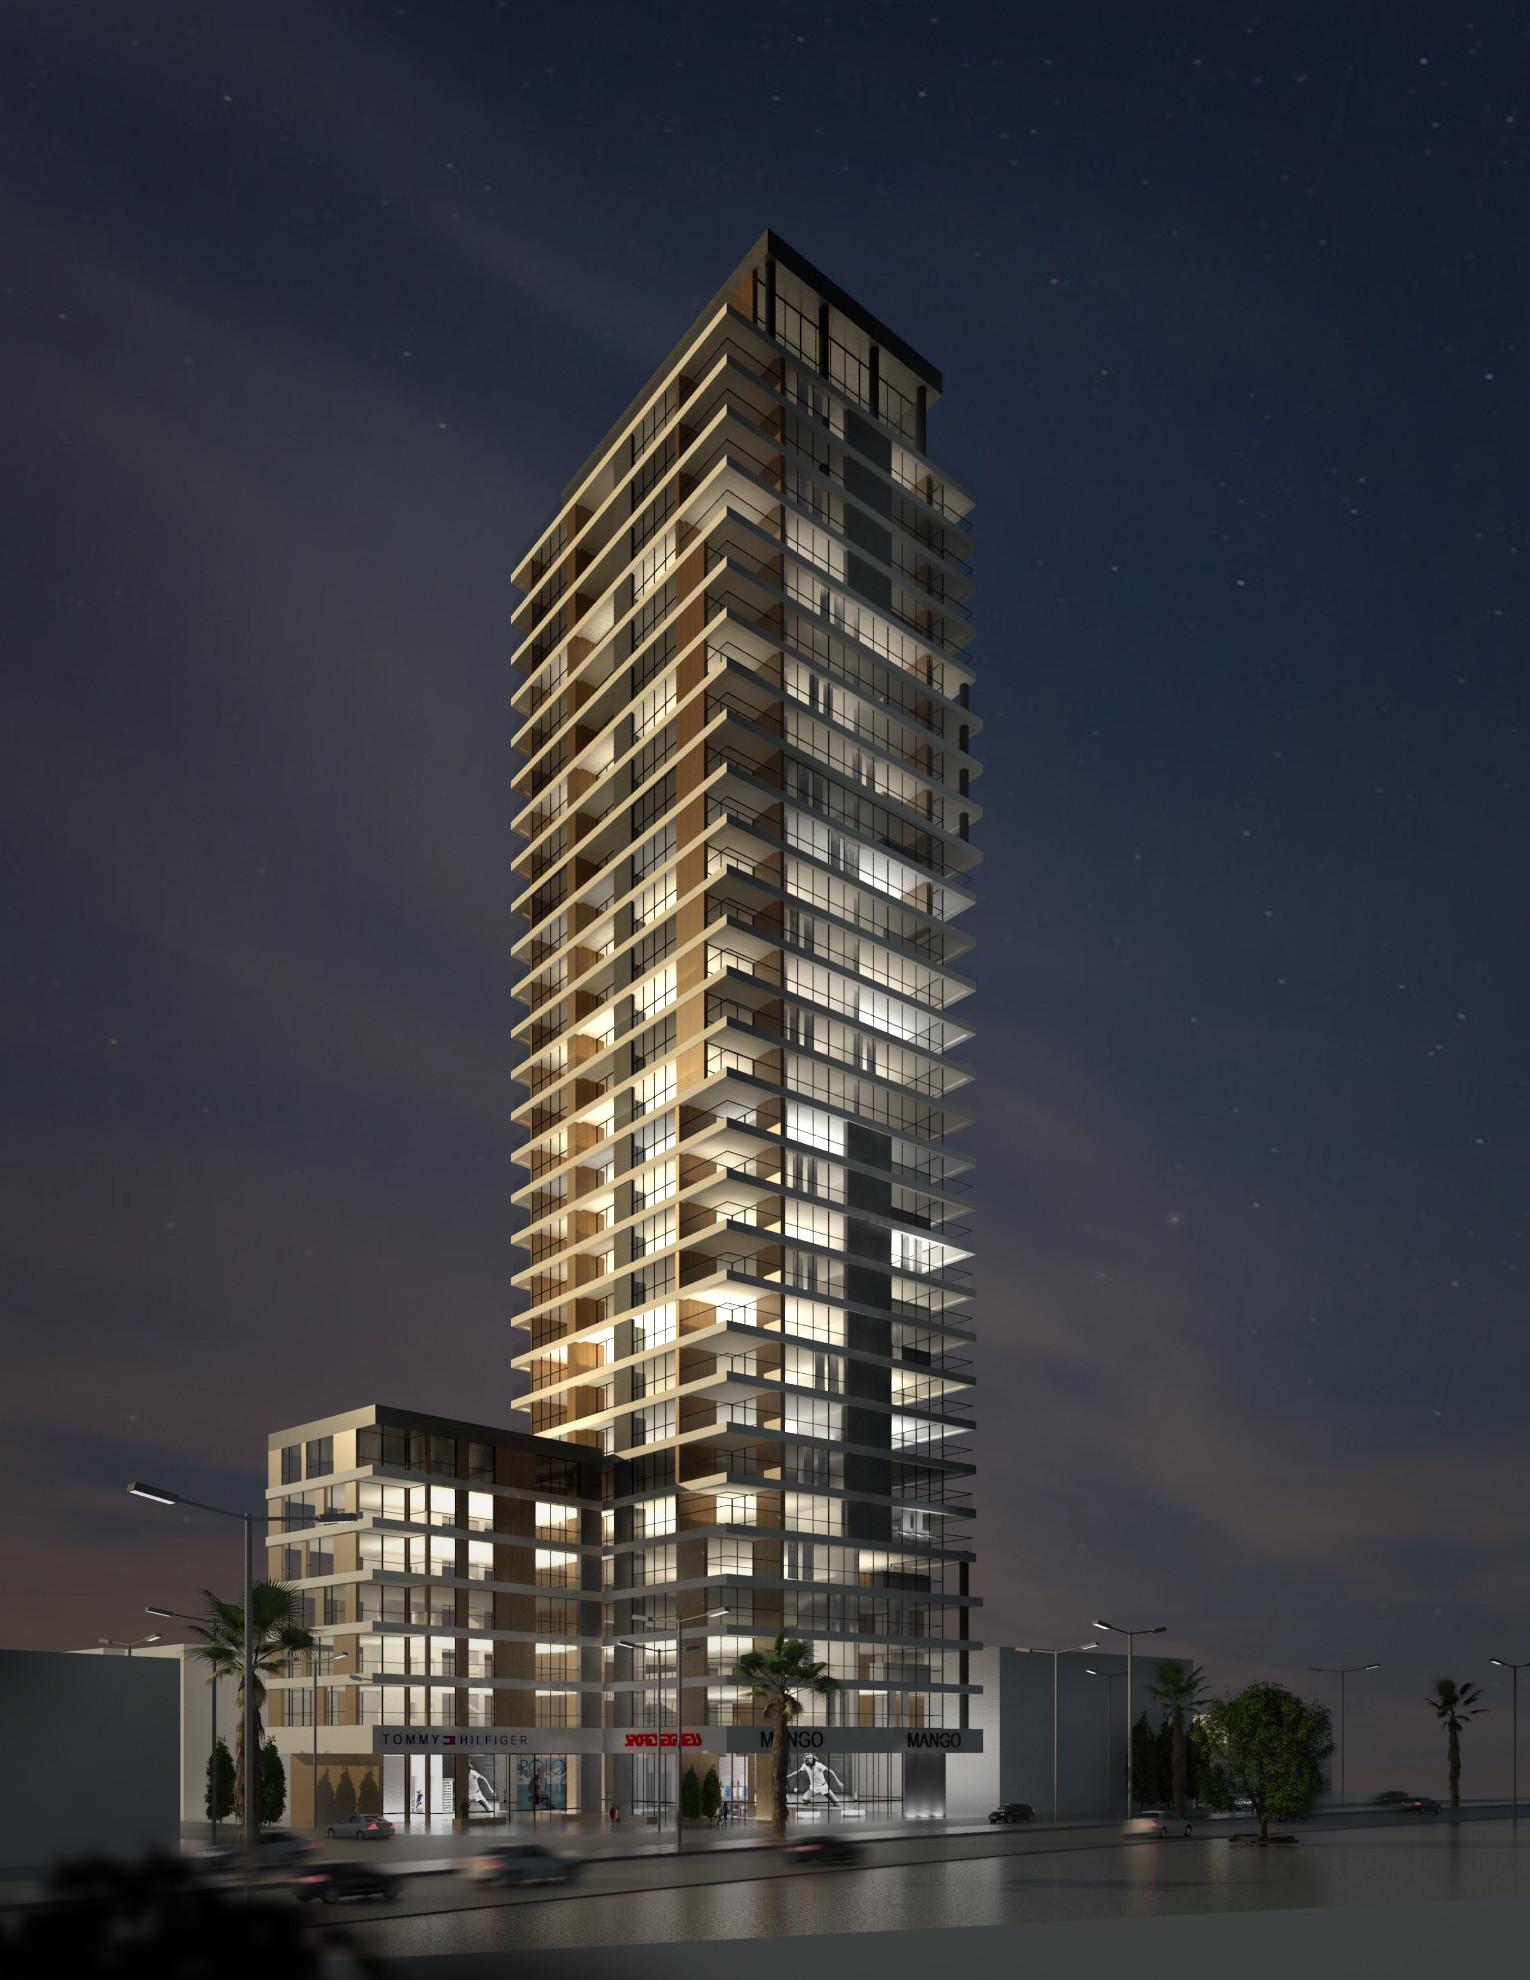 Itai Pick - mixed use building, night scene